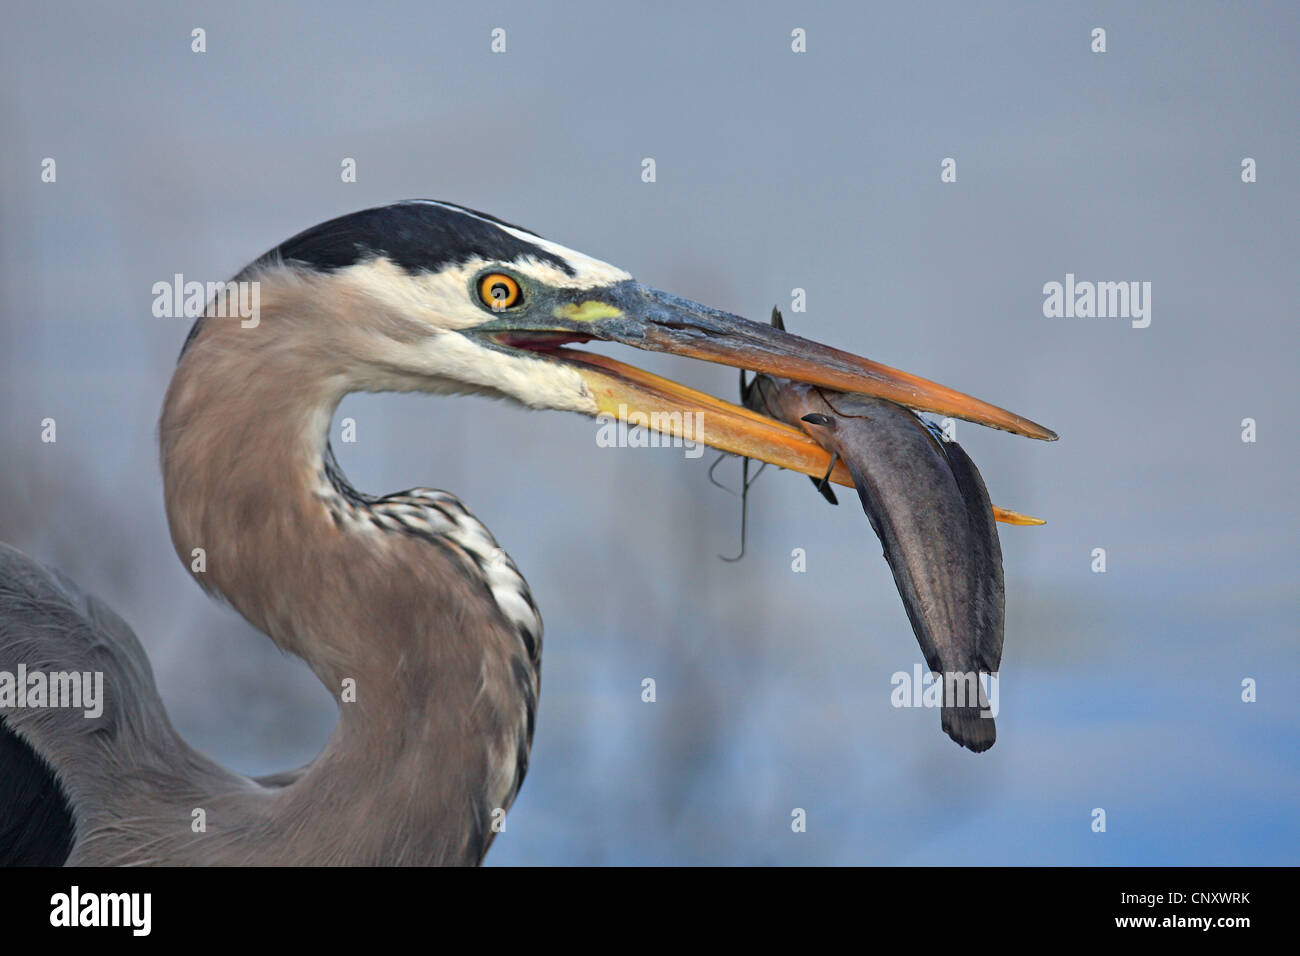 great blue heron (Ardea herodias), with fish in its beak, USA, Florida, Everglades National Park - Stock Image